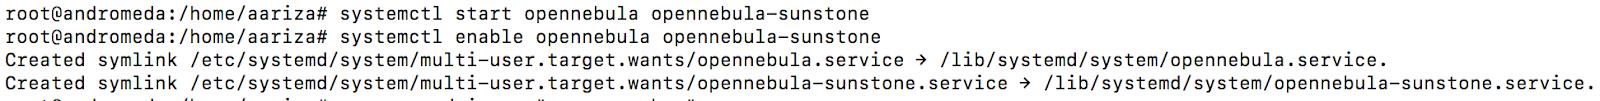 iniciar_sunstone